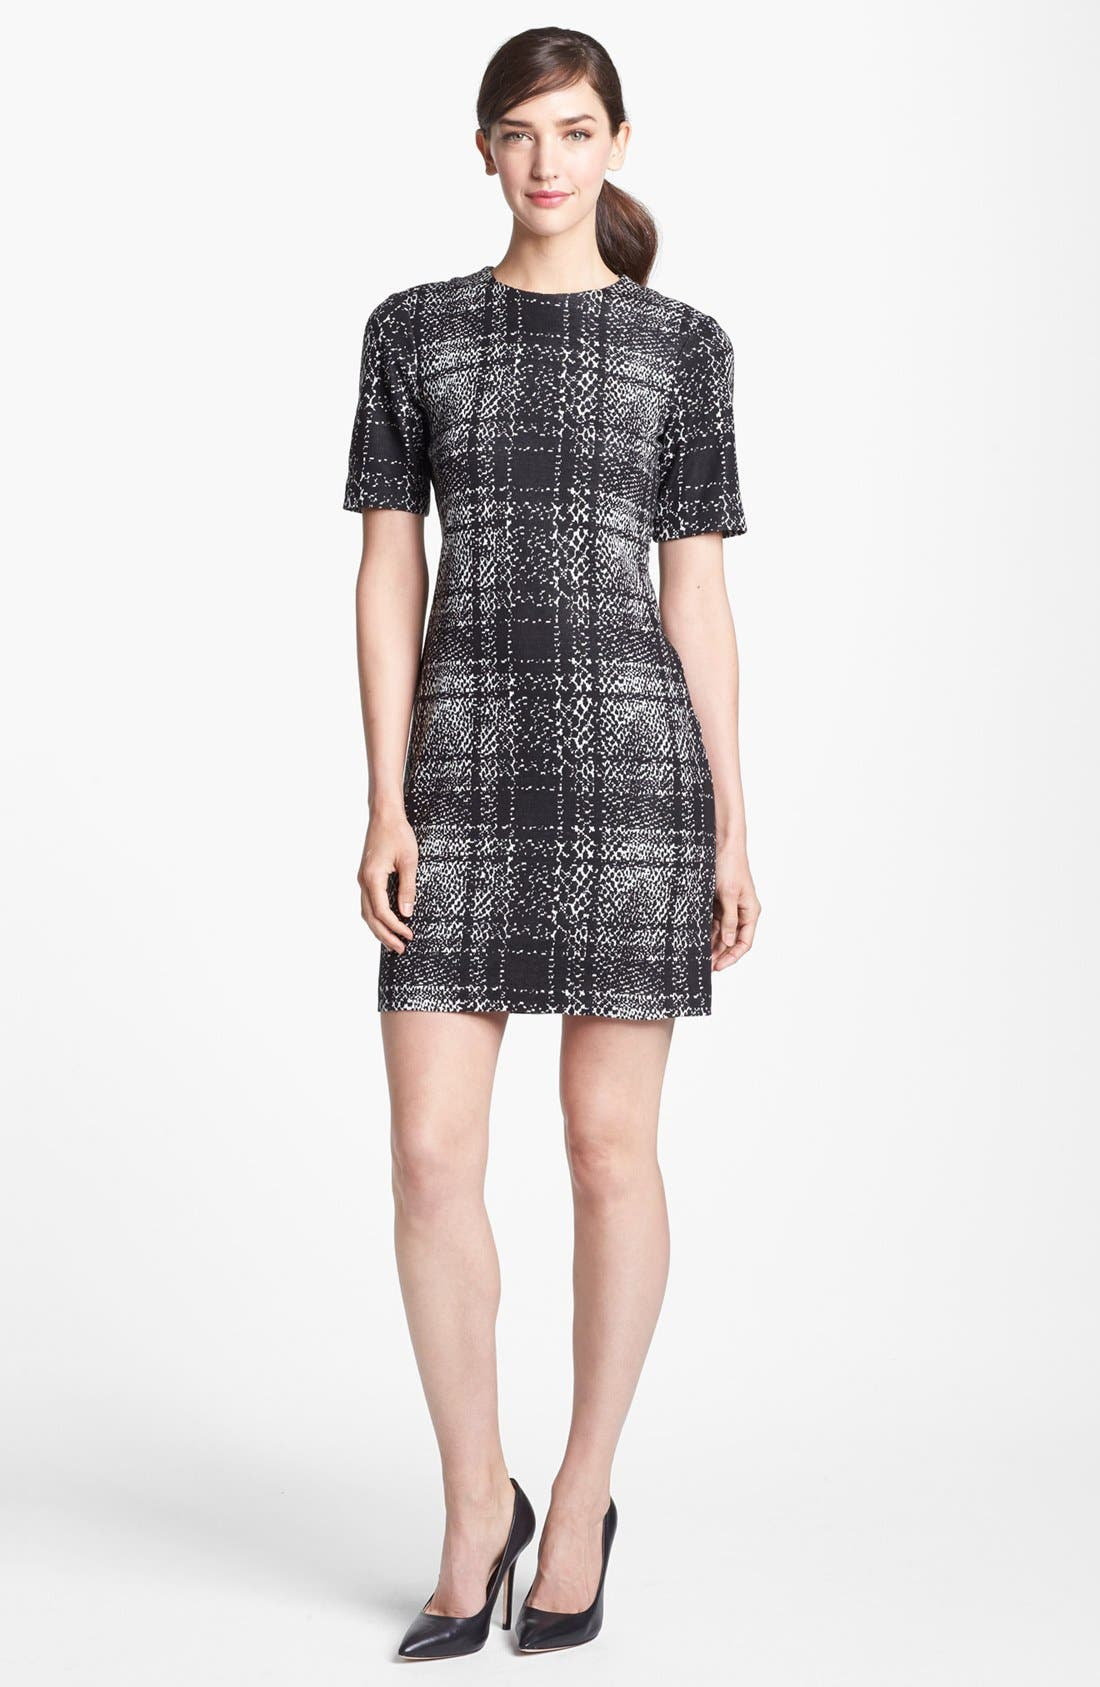 Main Image - 4.collective Mixed Print Sheath Dress